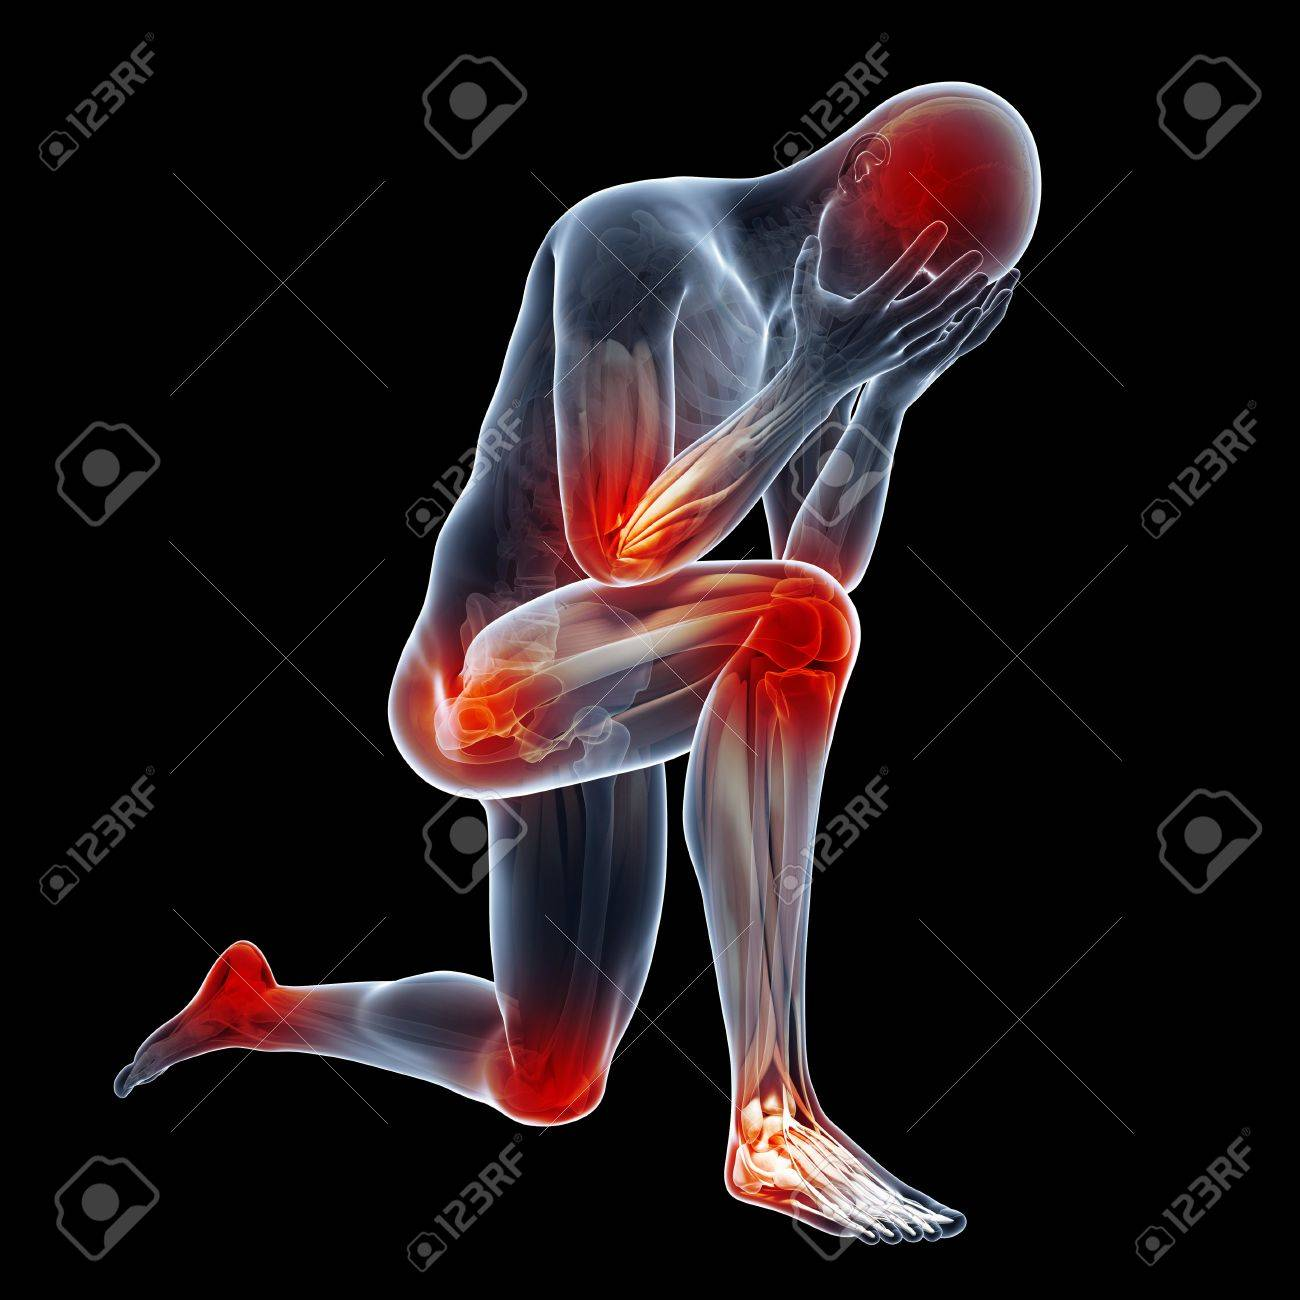 Human joint pain illustration stock photo picture and royalty free human joint pain illustration stock photo 76281504 ccuart Choice Image